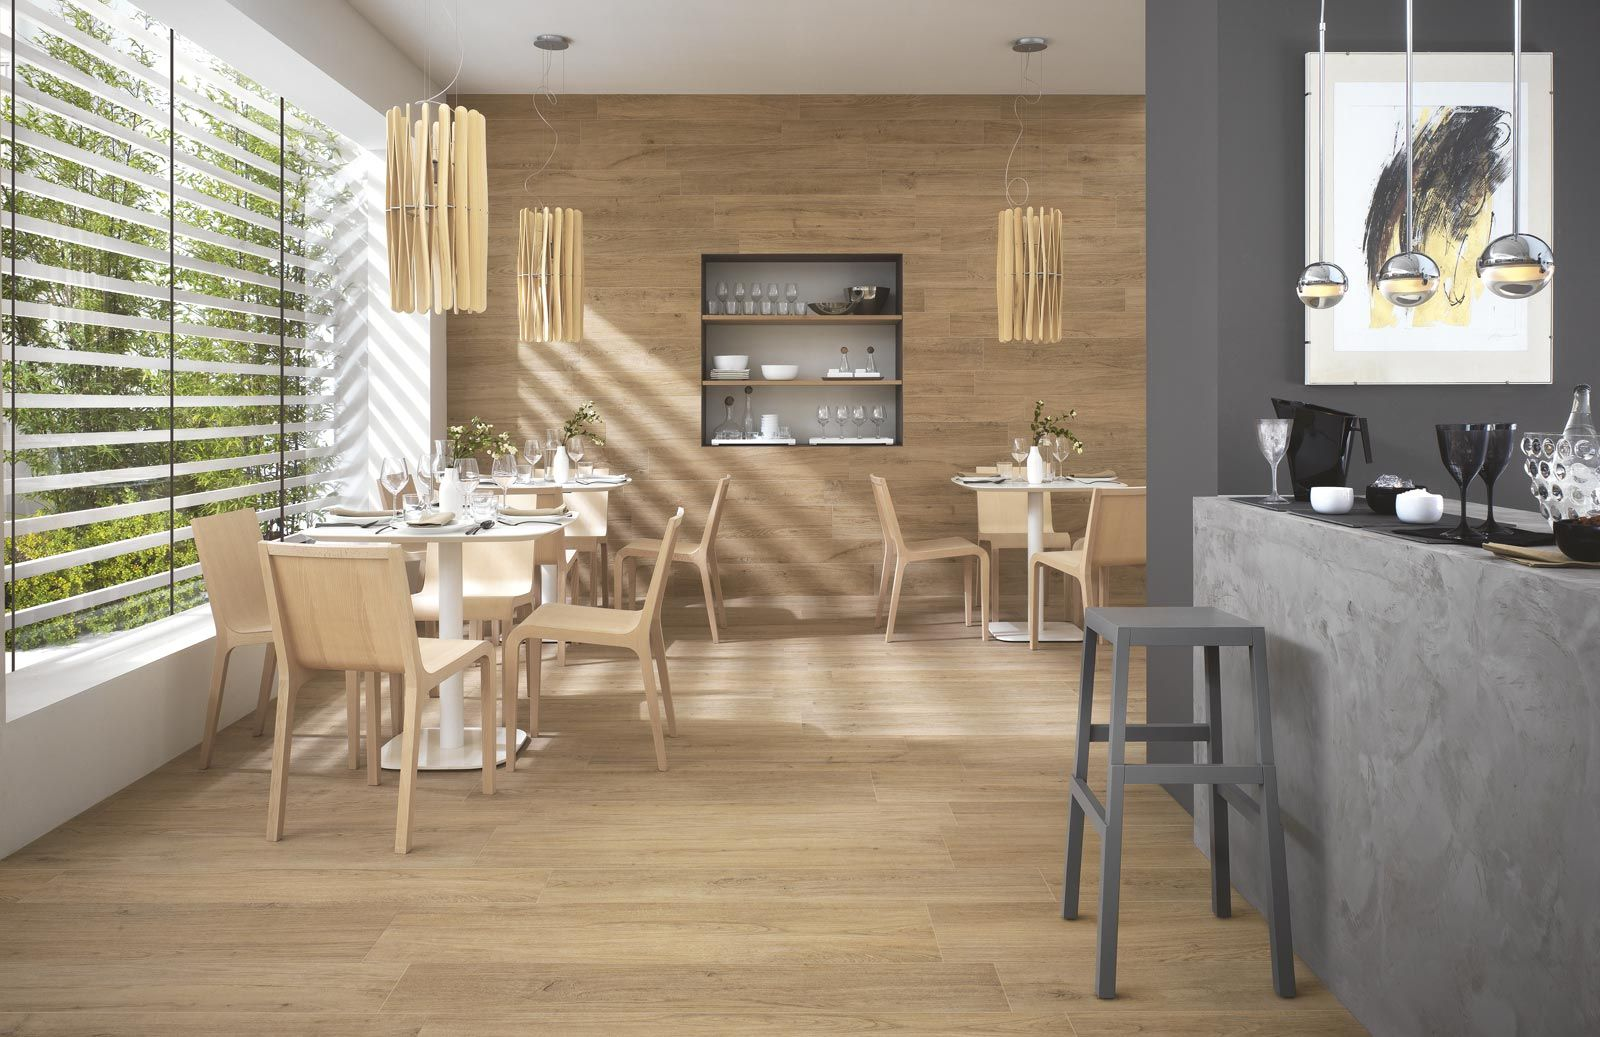 #Ragno #Woodliving Rovere Biondo 15x120 cm R40L | #Porcelain stoneware #Wood #15x120 | on #bathroom39.com at 47 Euro/sqm | #tiles #ceramic #floor #bathroom #kitchen #outdoor